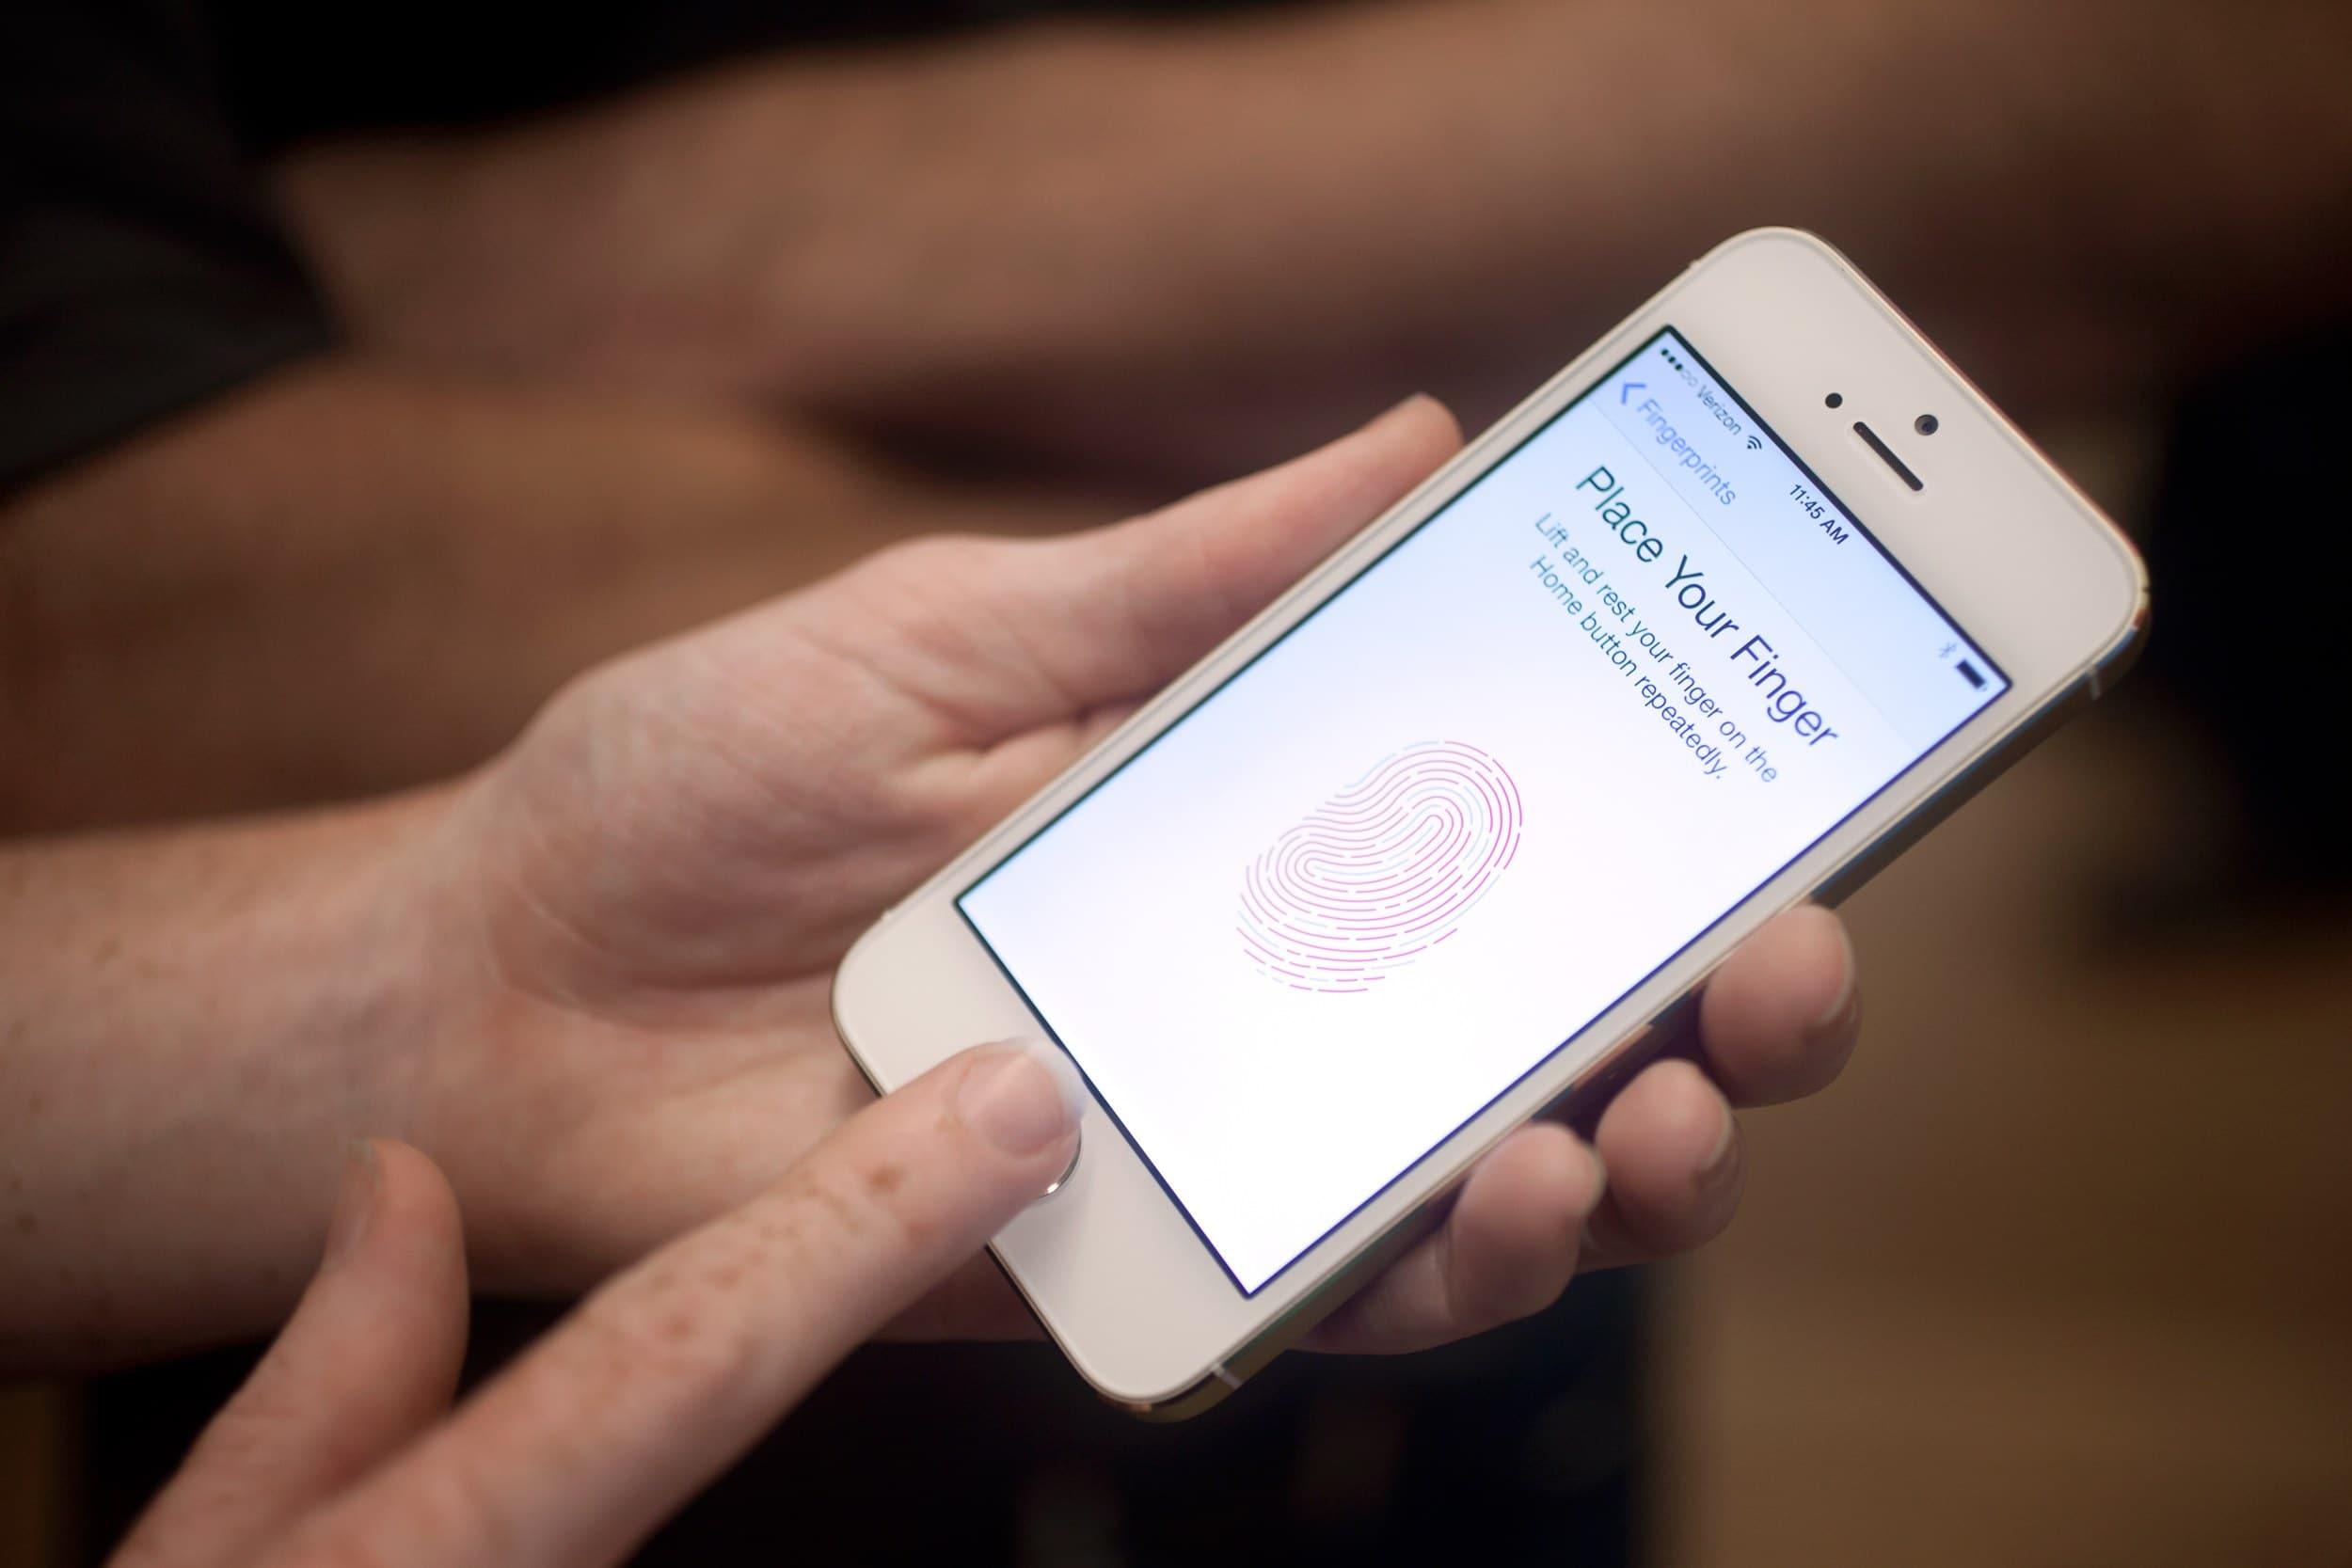 phone with fingerprint sensr